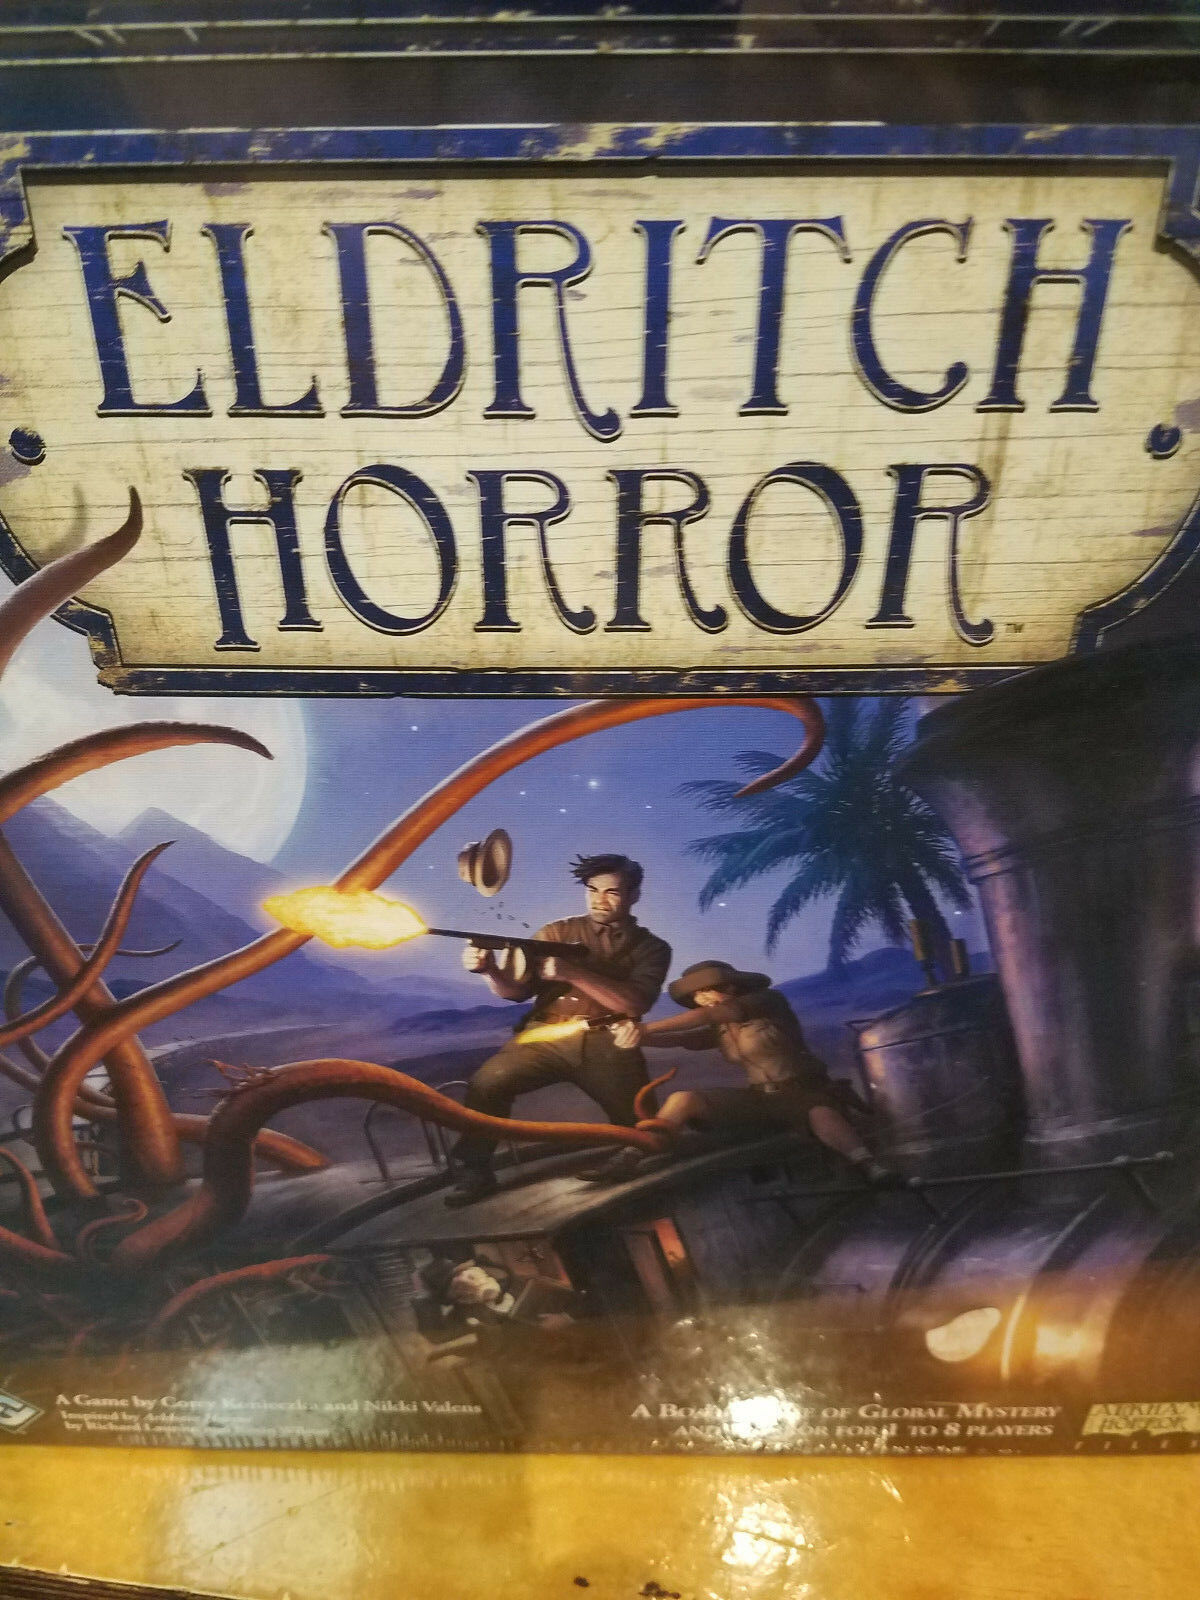 Eldritch Horror Core Base Set - Fantasy Flight Board Game New